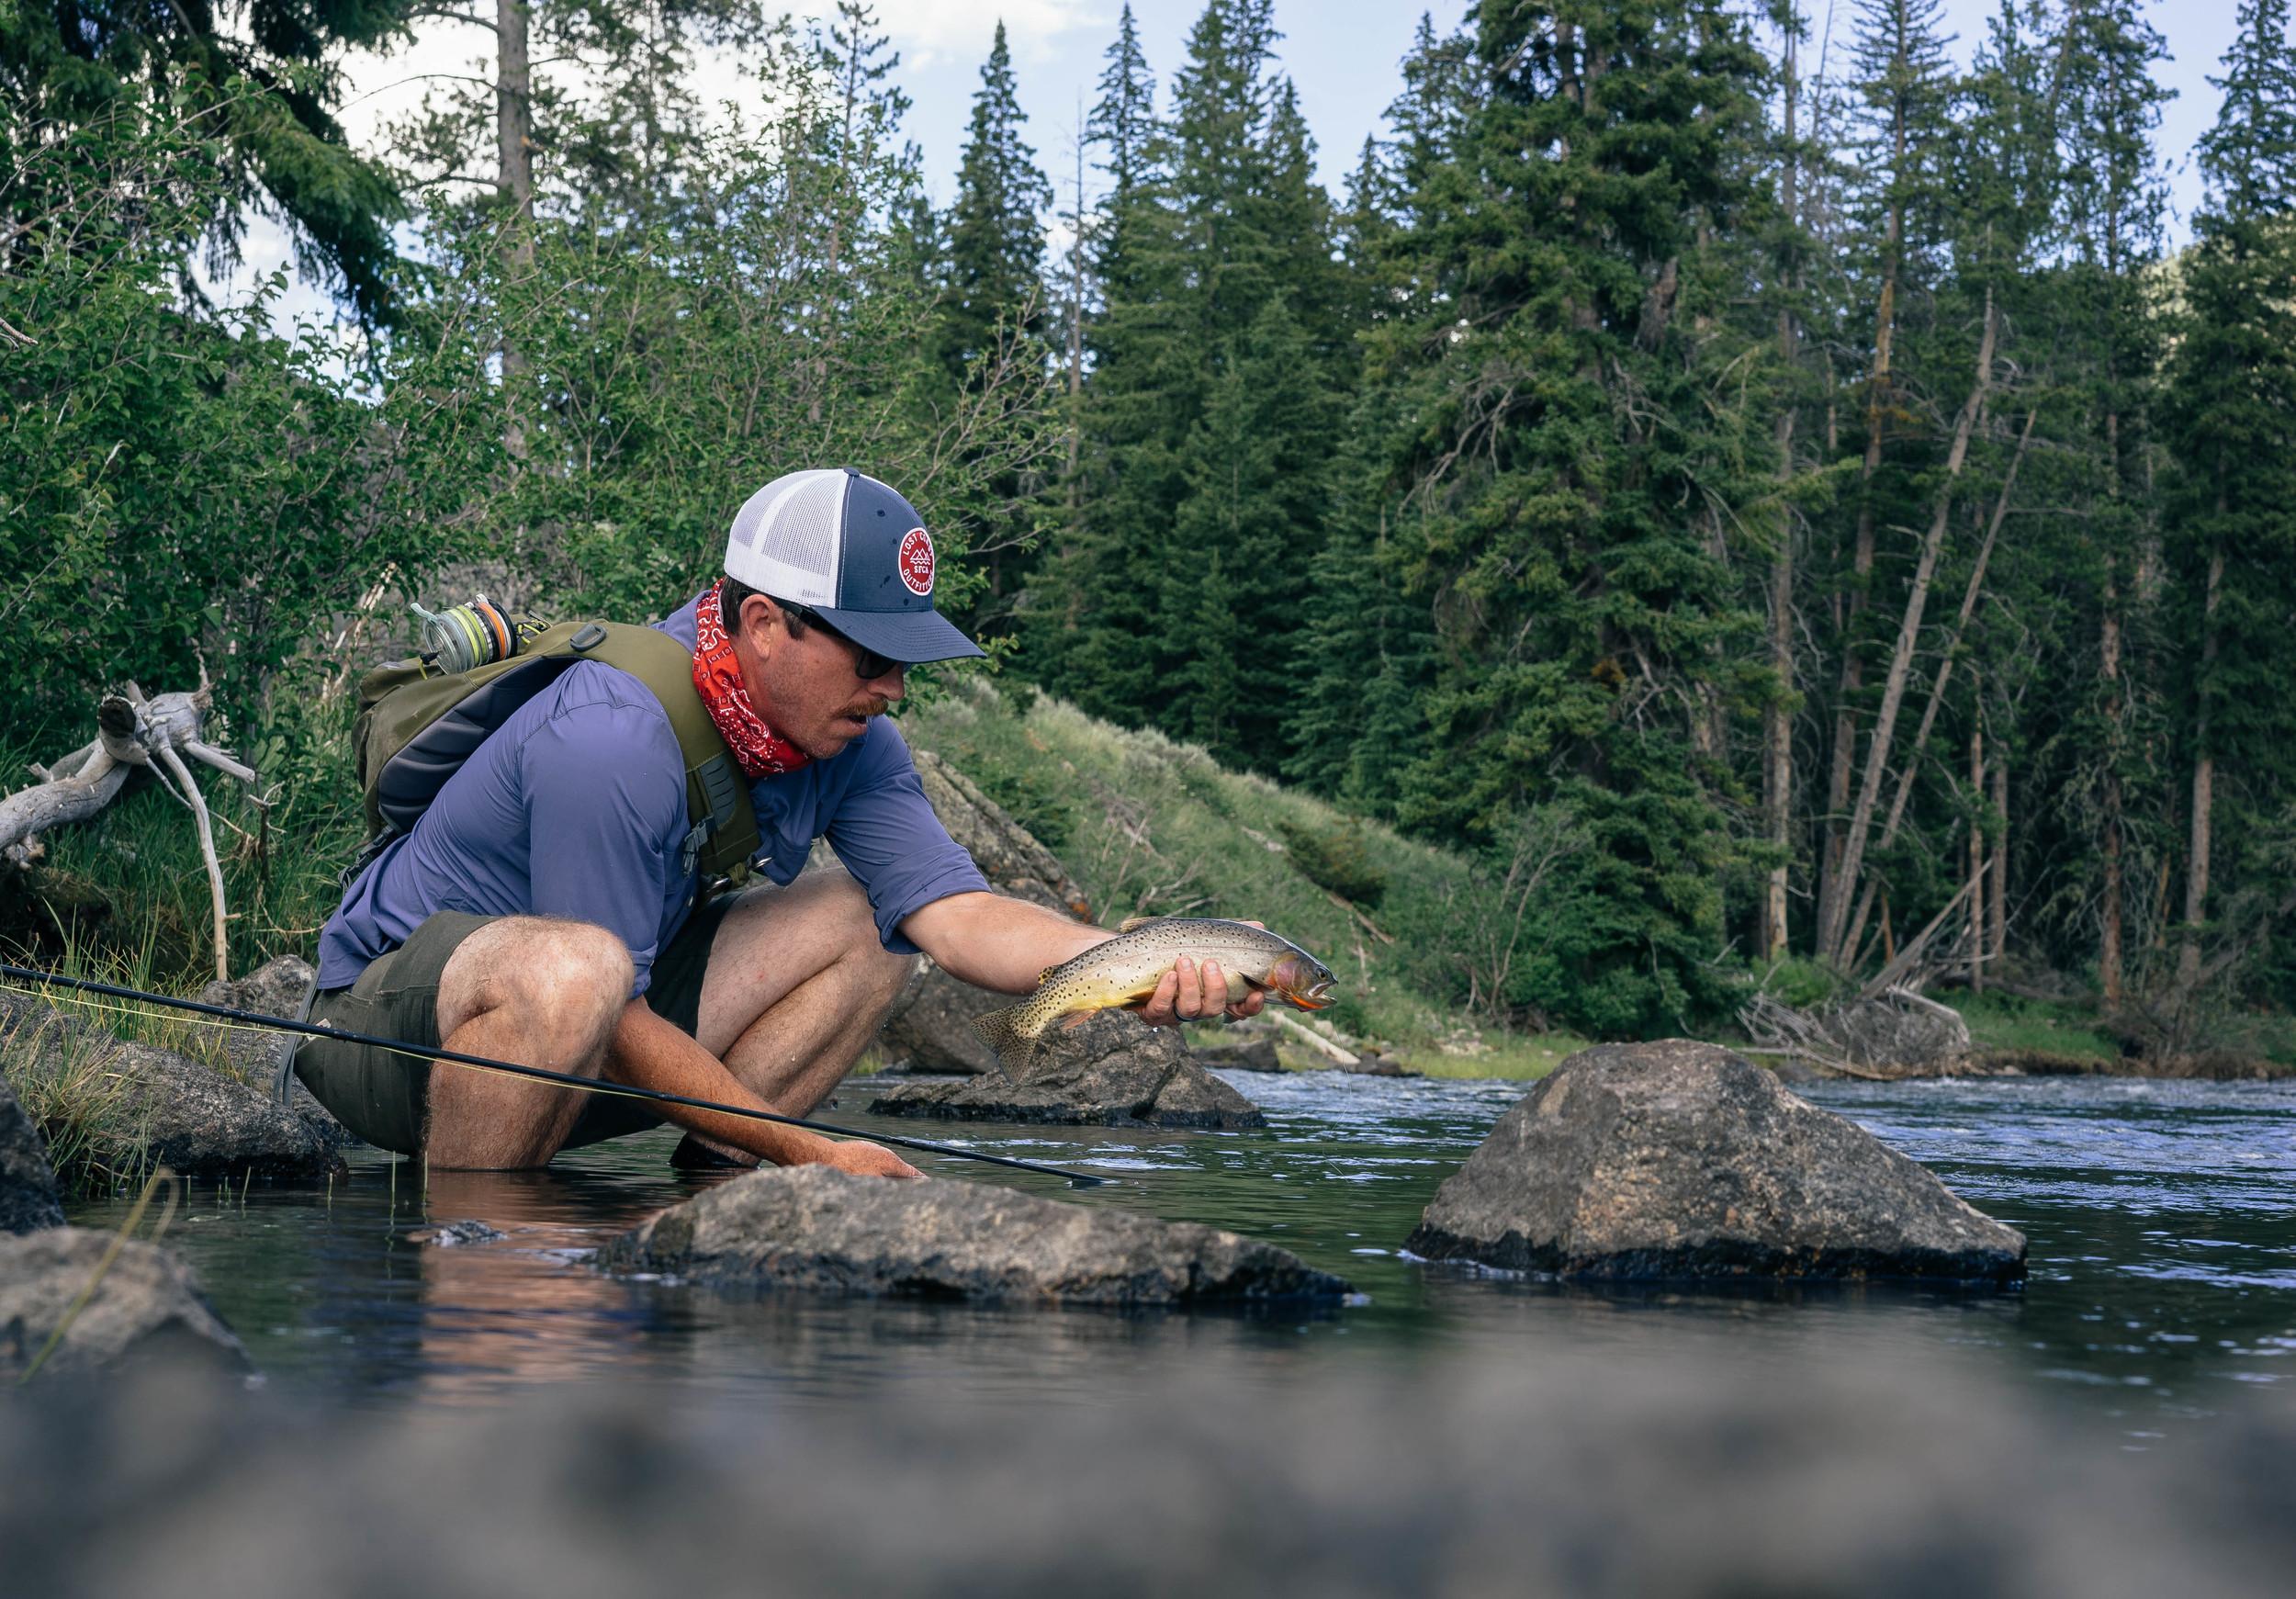 BaetisandStones-Yellowstone-Cutthroat-11.jpg